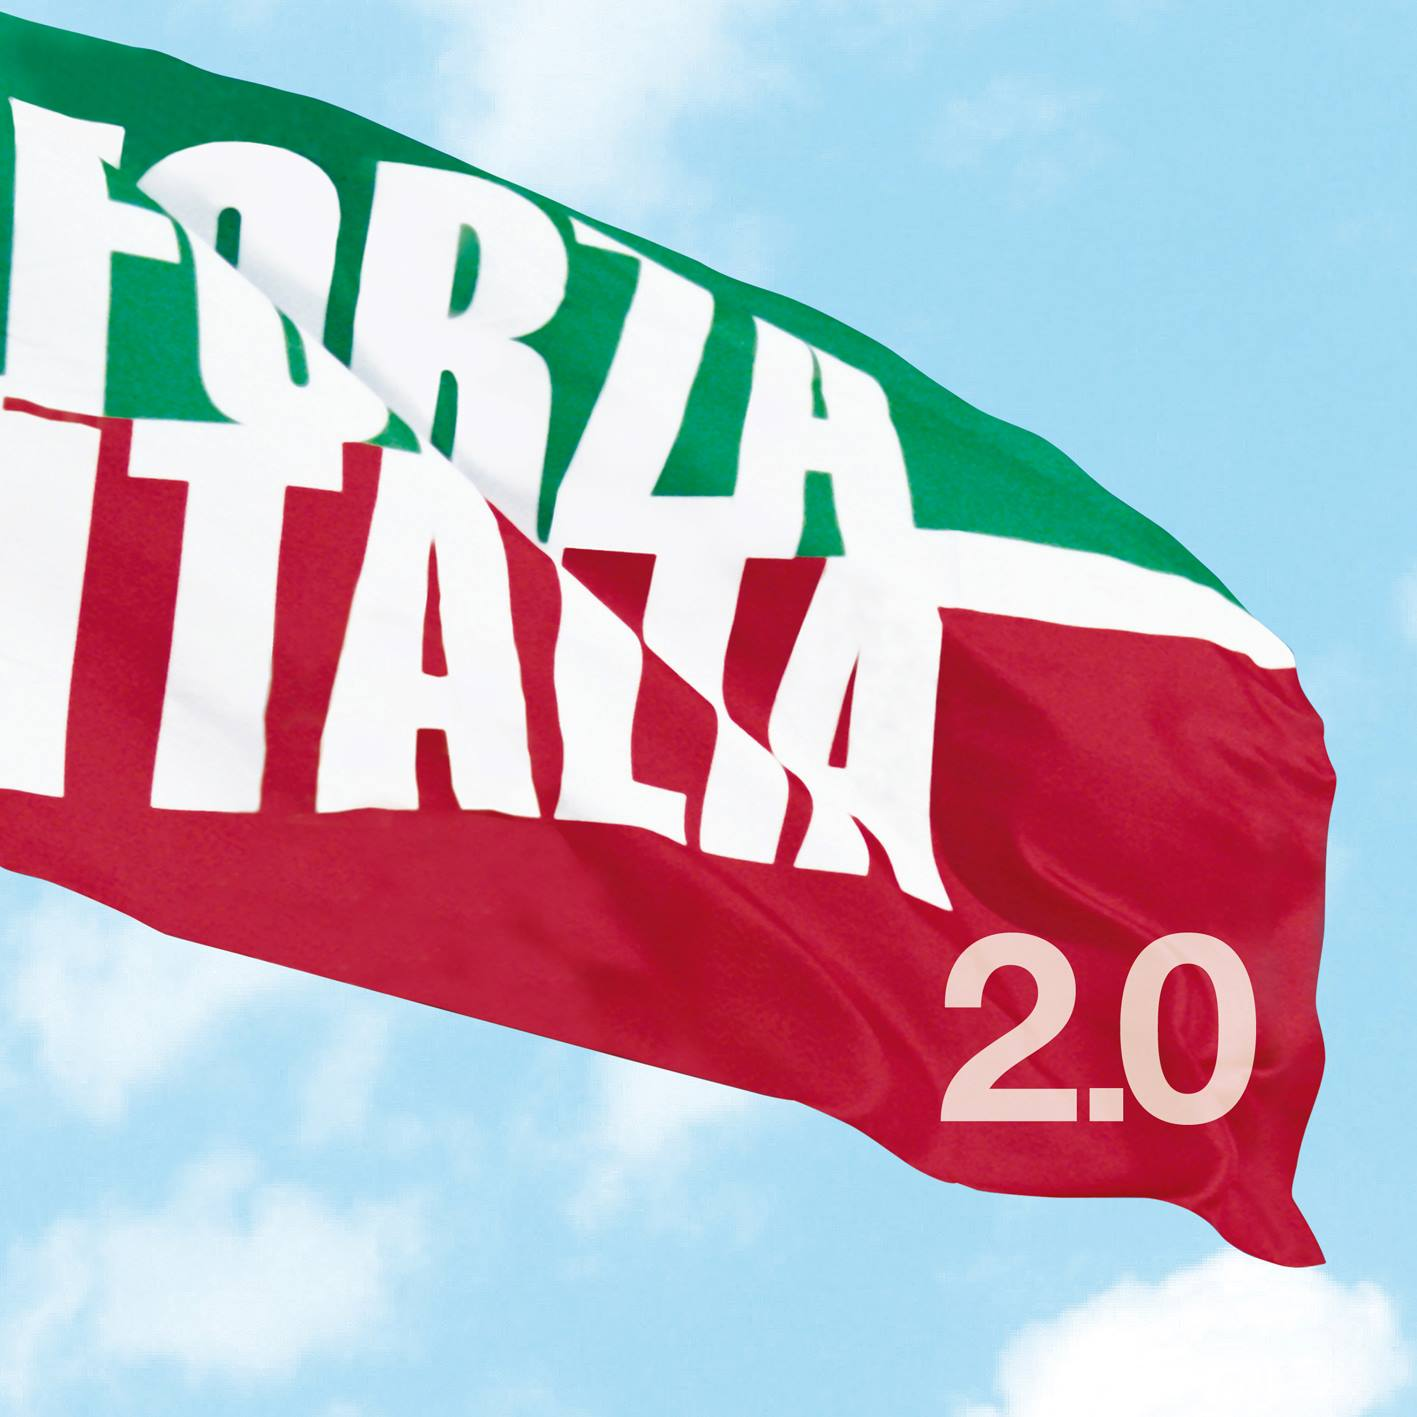 Gioacchino alfano forza italia for Forza italia deputati